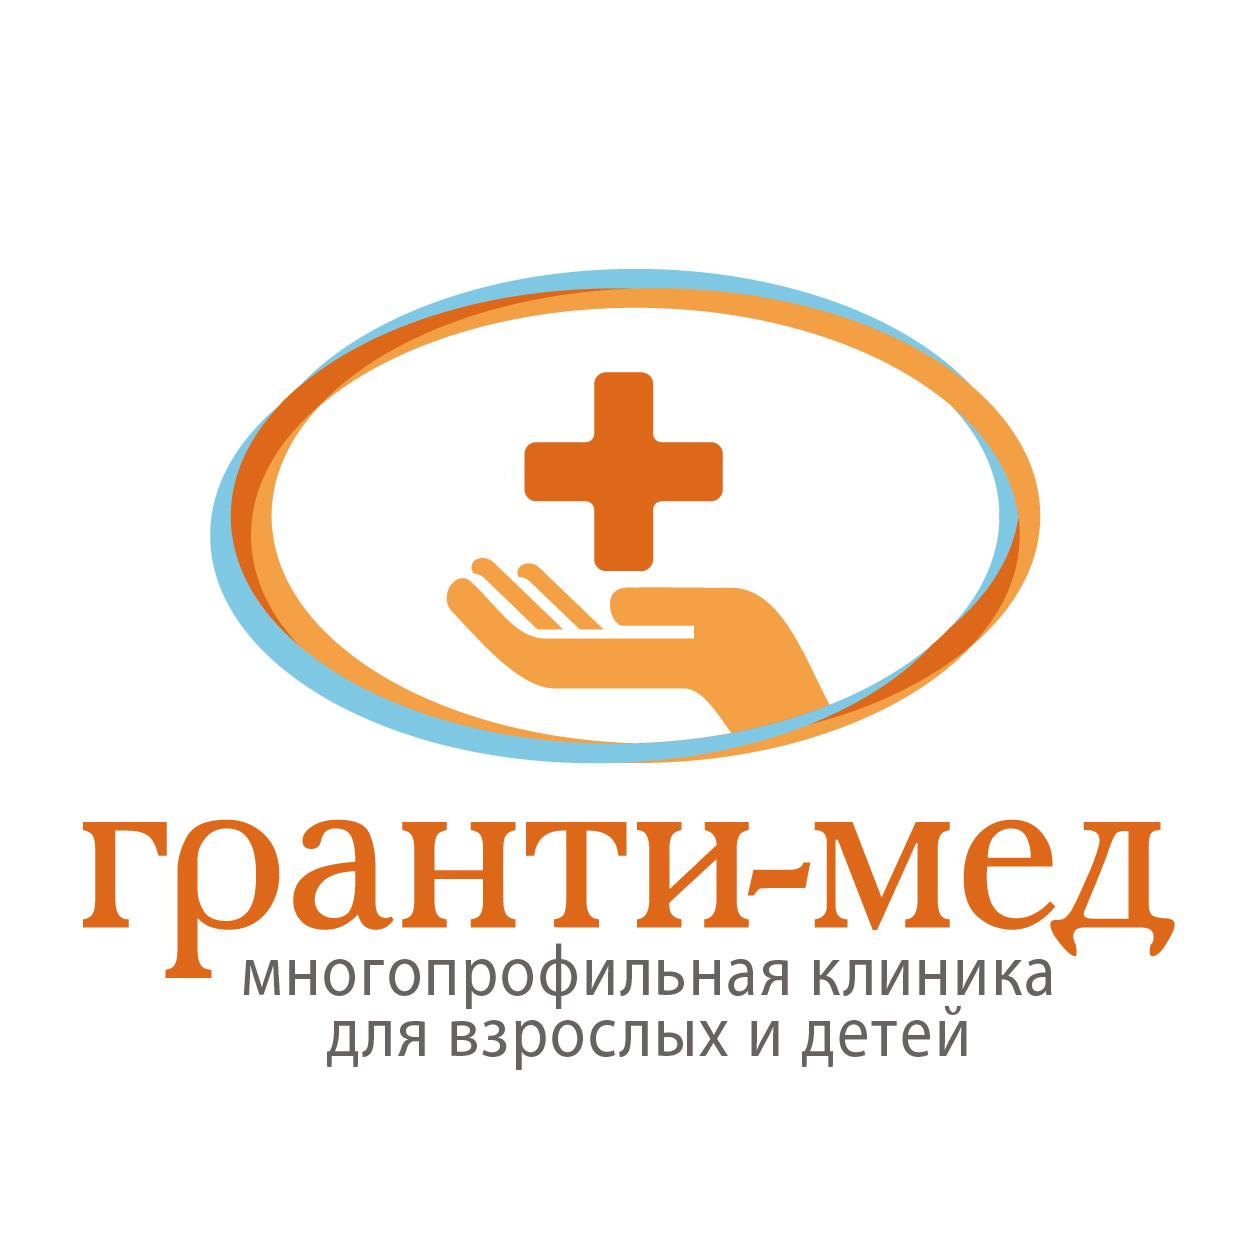 Клиника гранти мед спб на корнеева